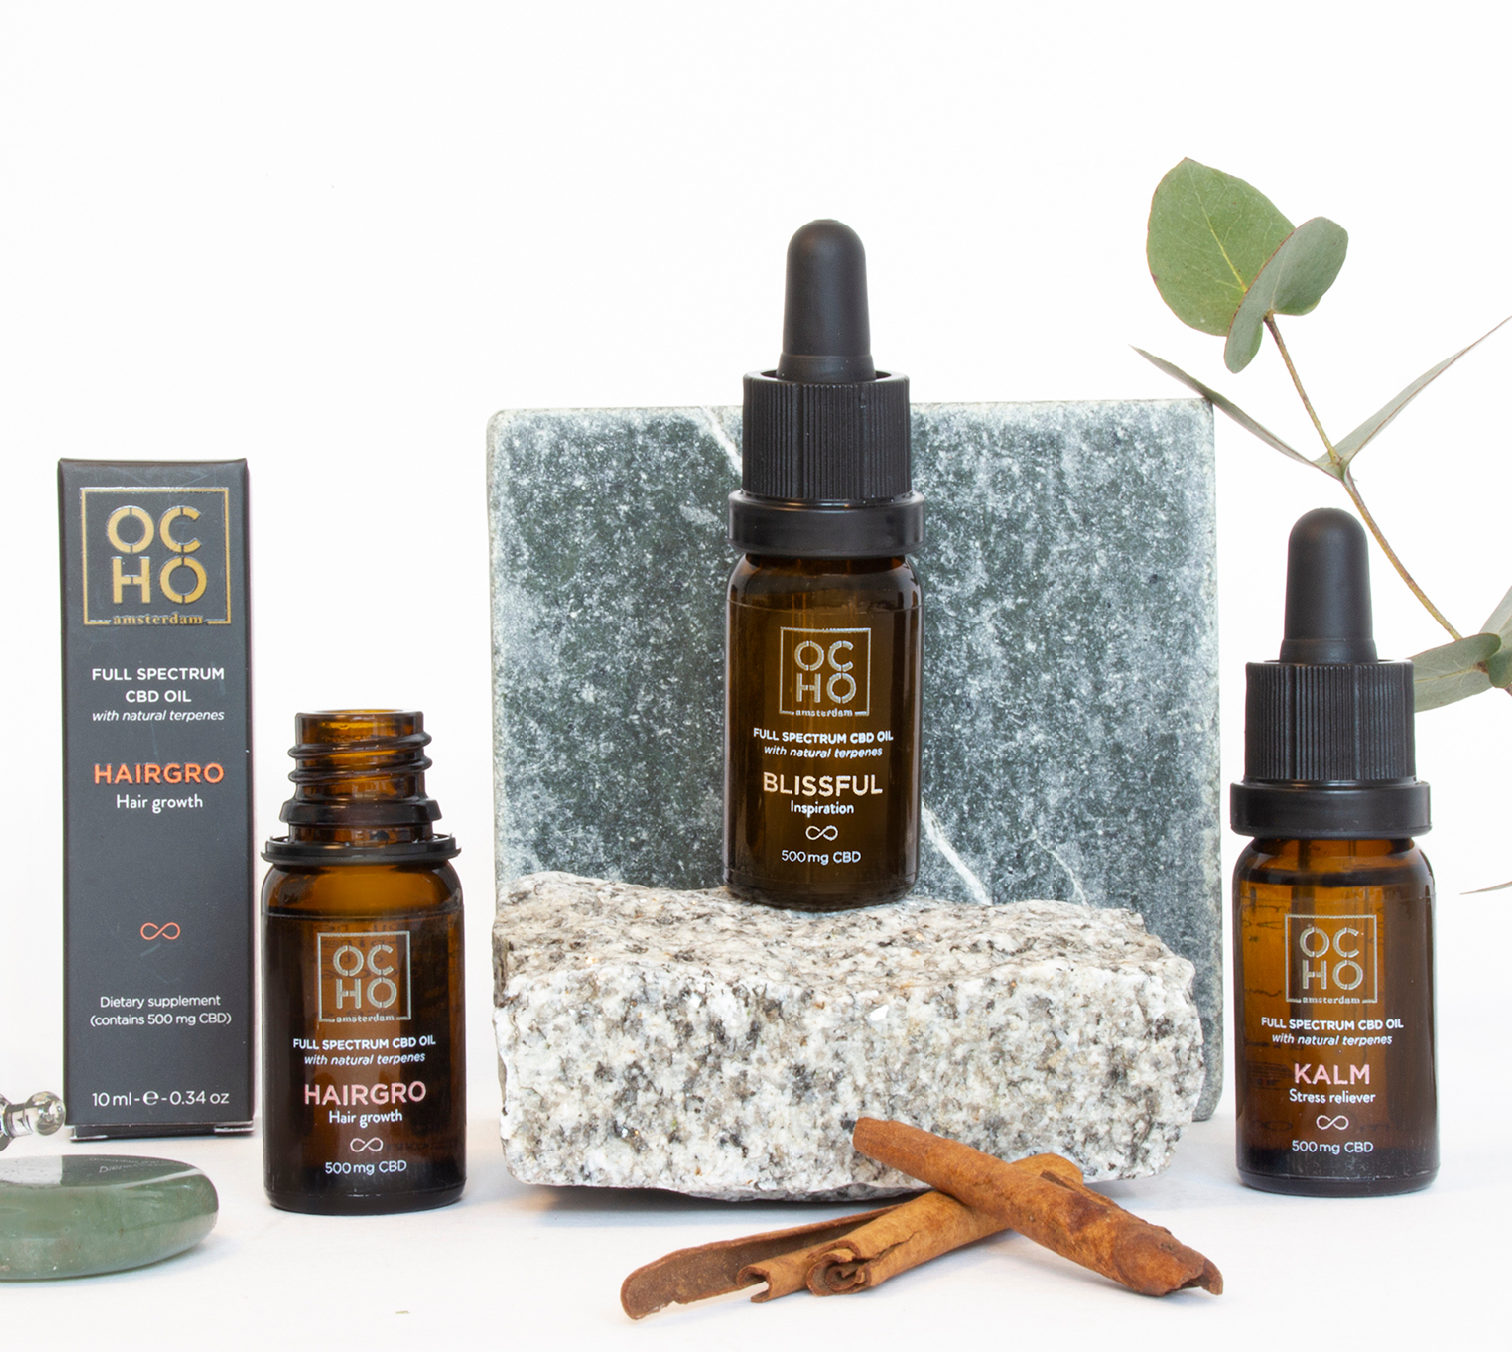 Ocho CBD oils packaging design and set composition